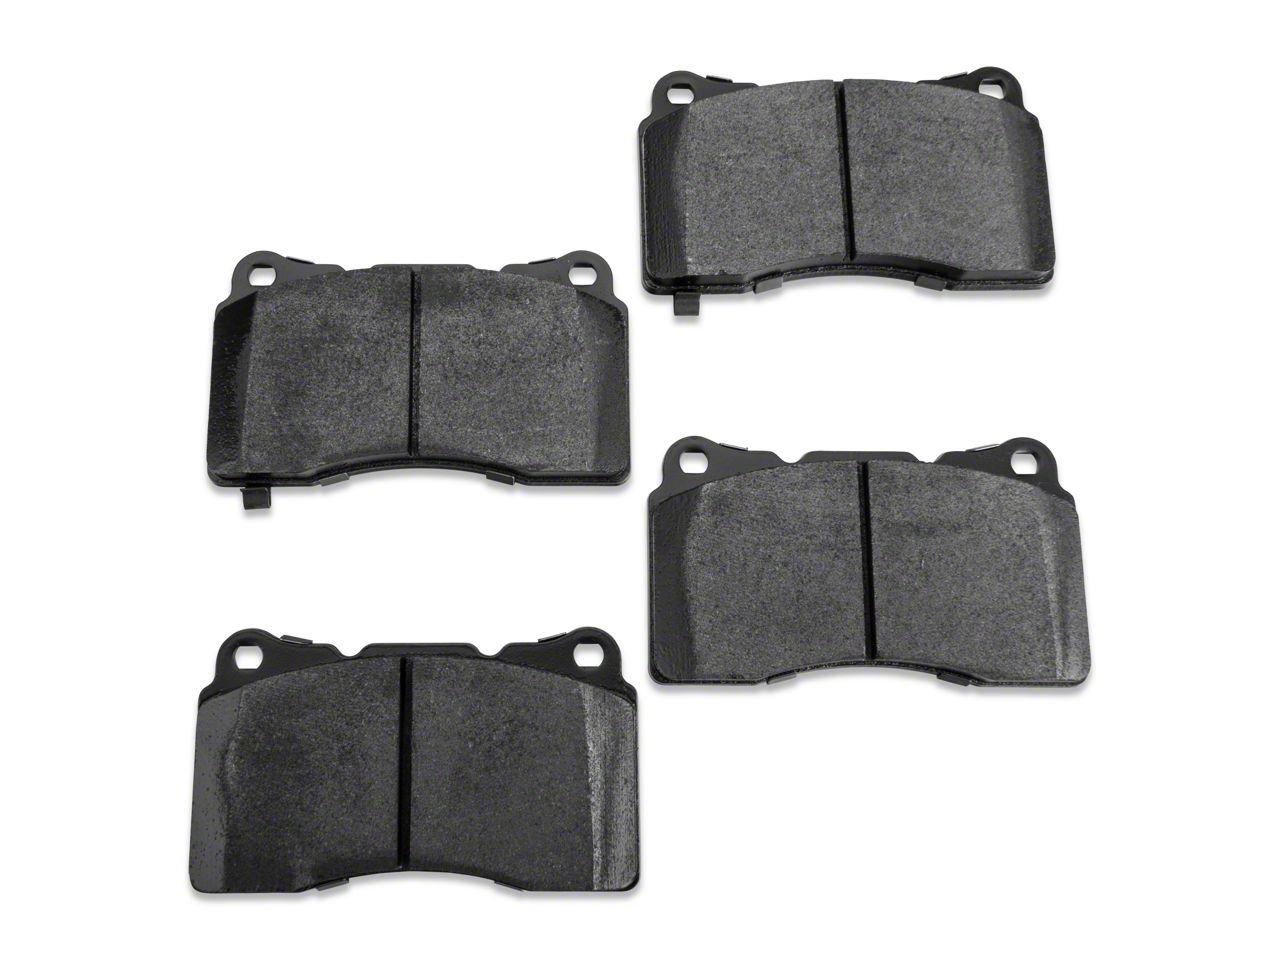 Hawk Performance Ceramic Brake Pads - Front Pair (11-14 GT Brembo; 12-13 BOSS 302; 07-12 GT500)